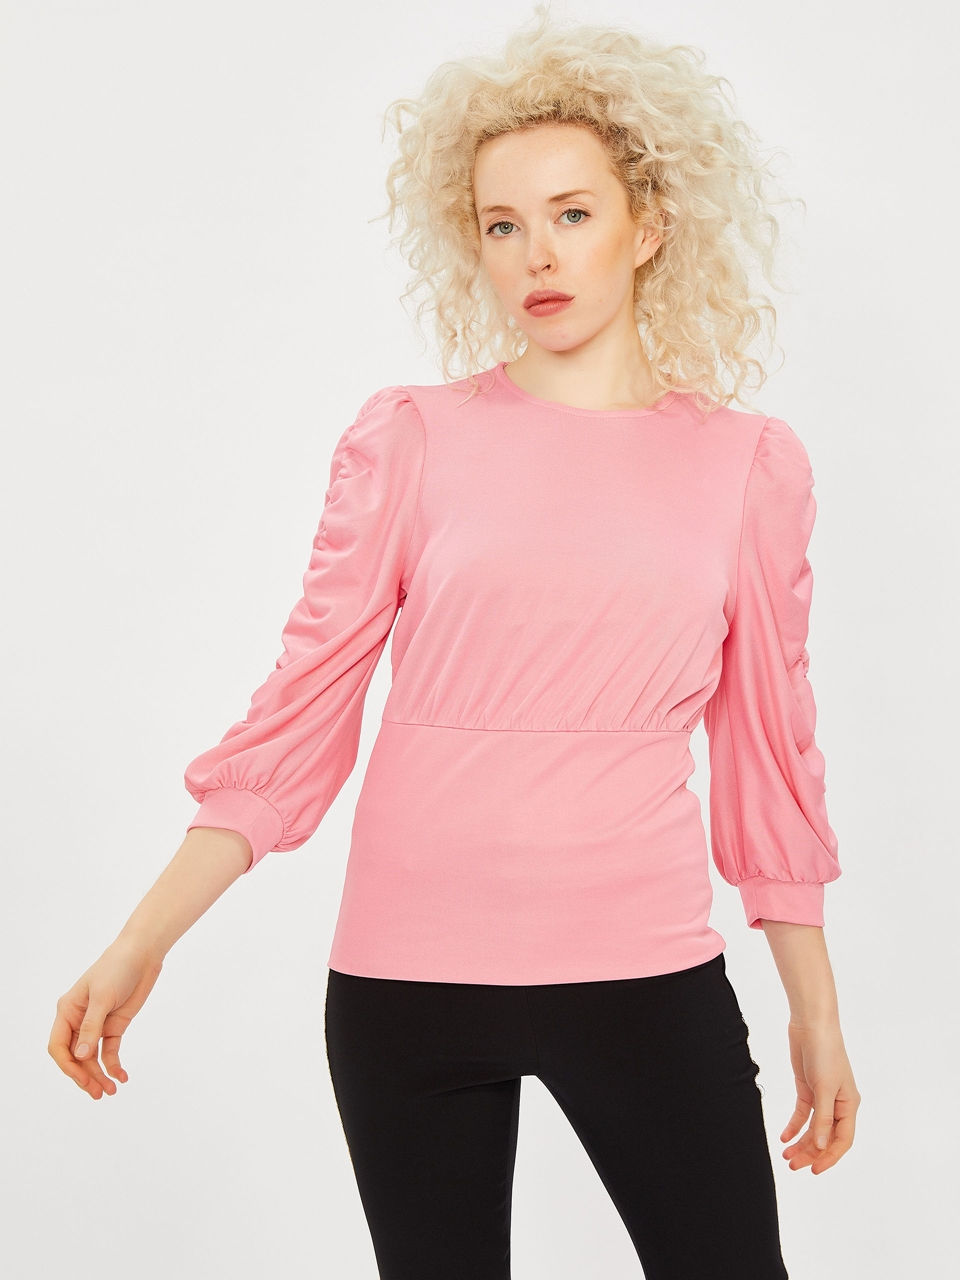 Sleeve Shirt Detailed Blouse